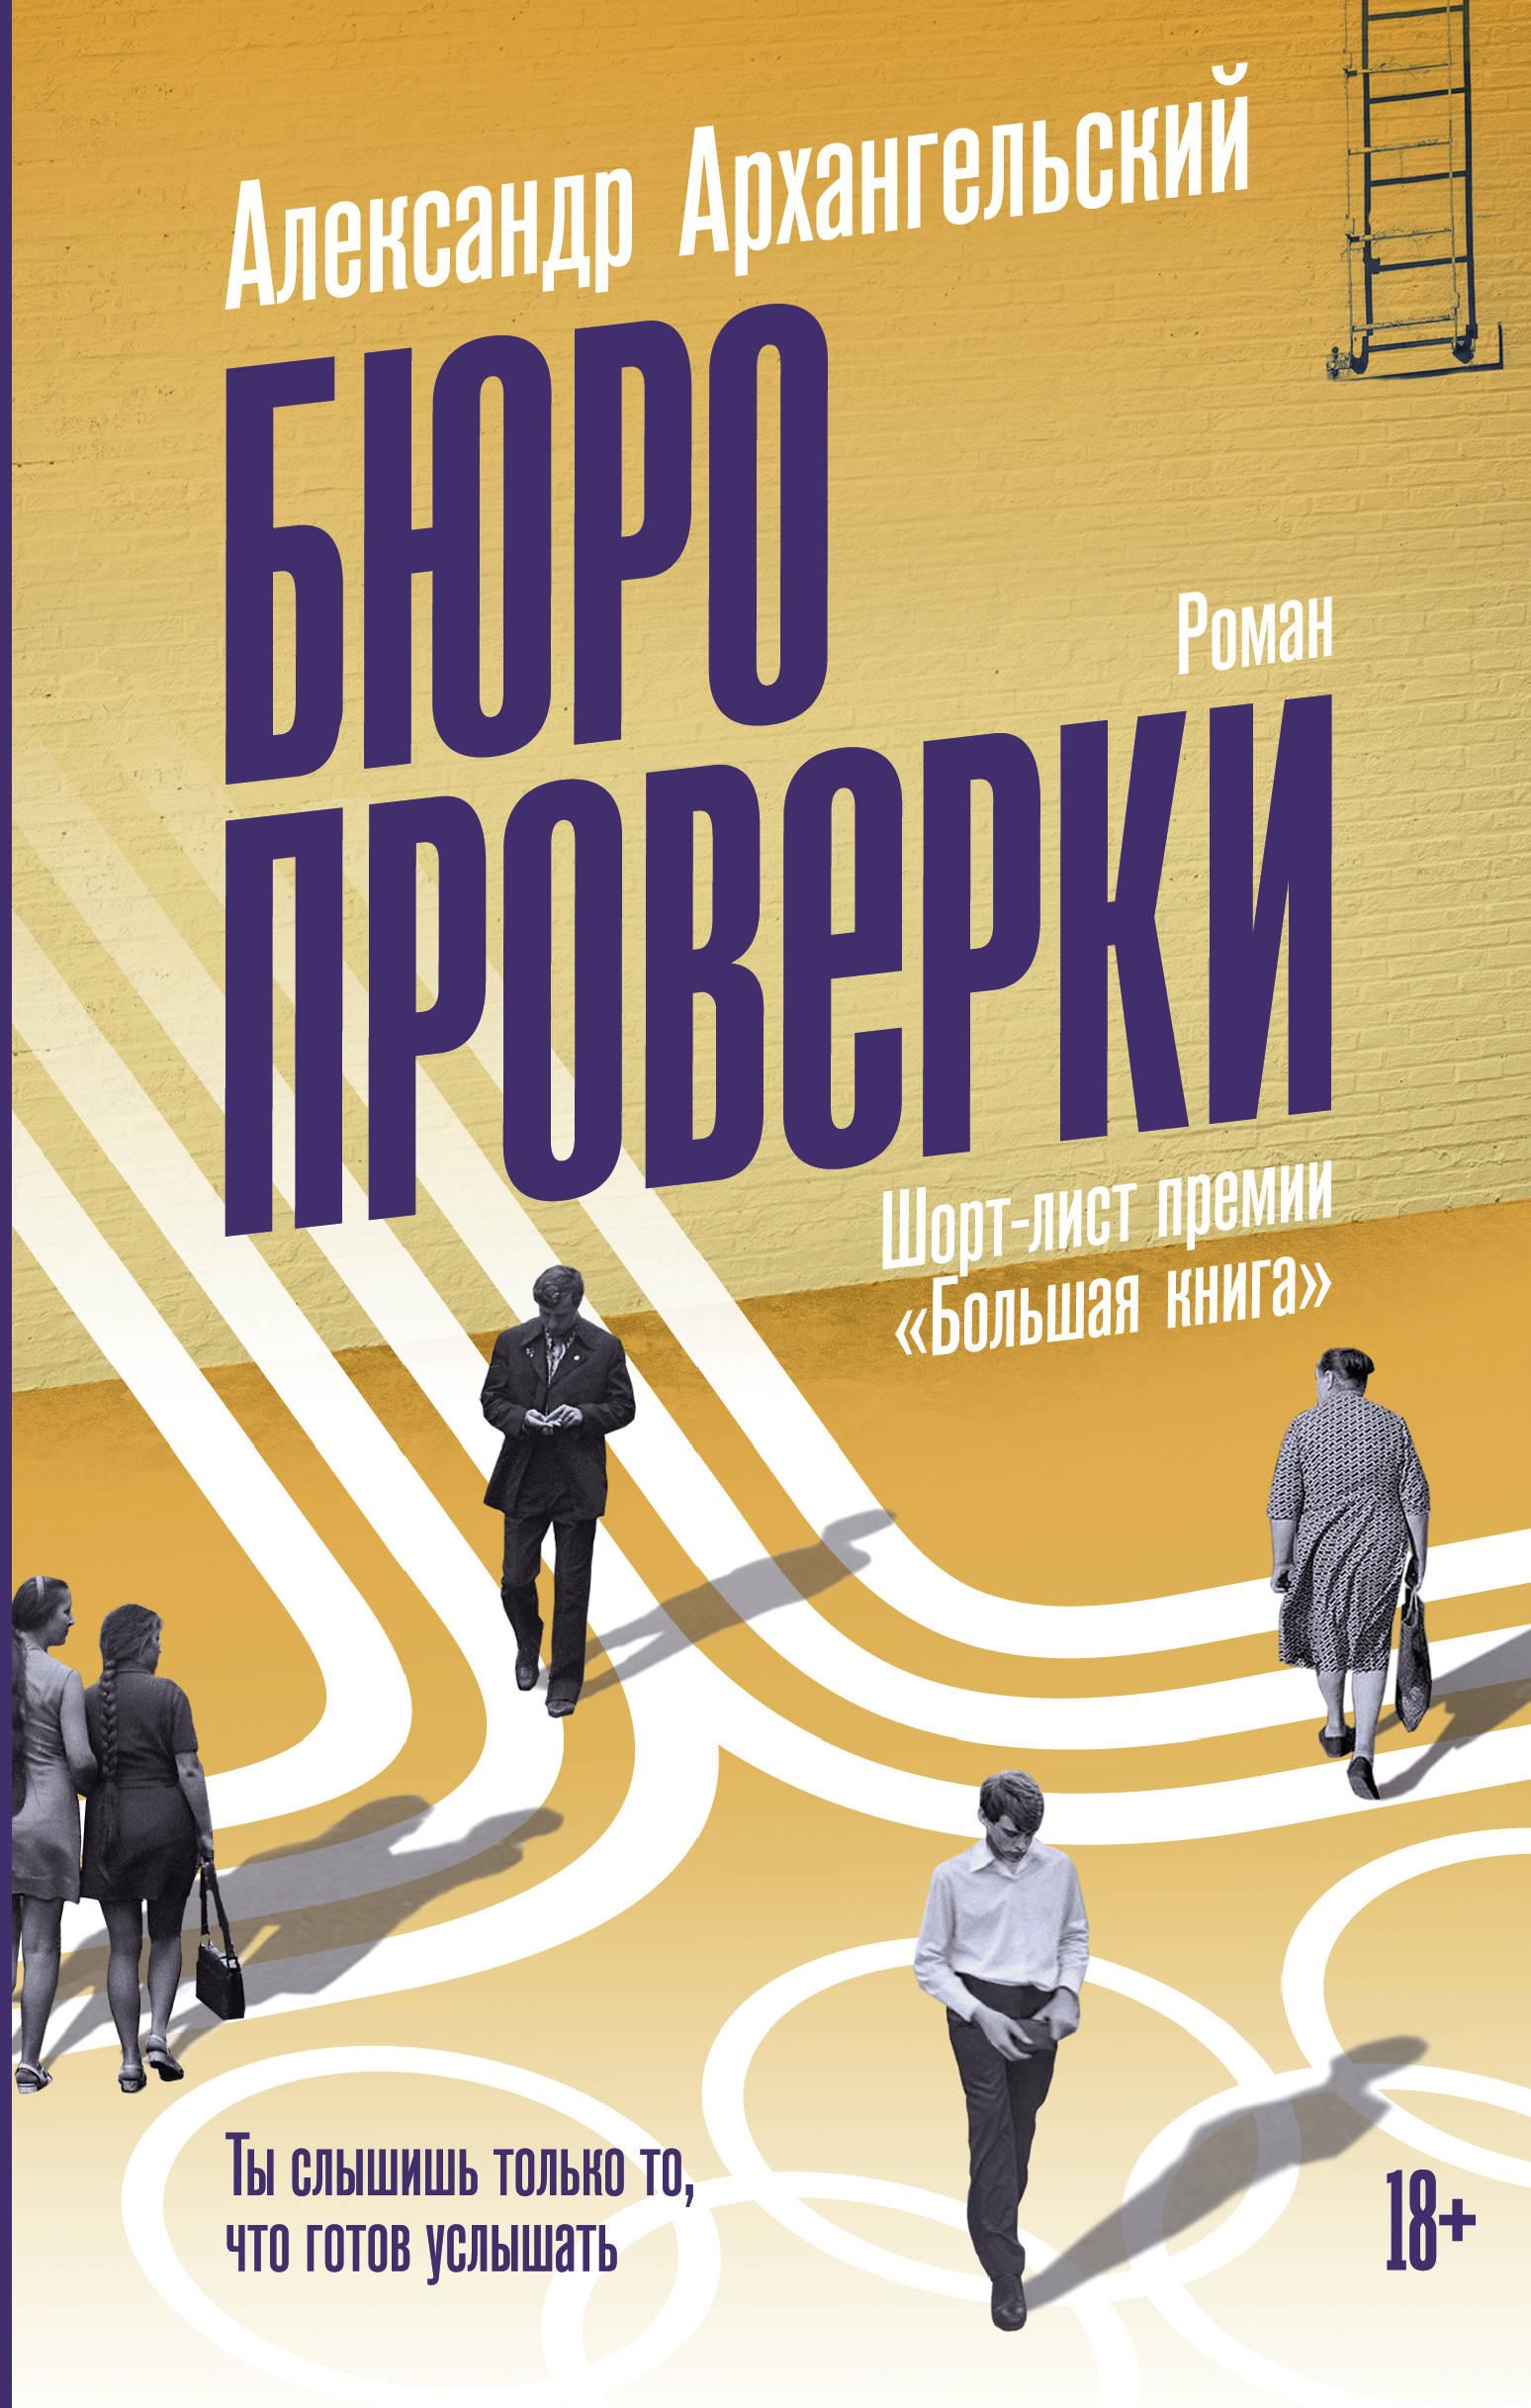 Александр Архангельский Бюро проверки